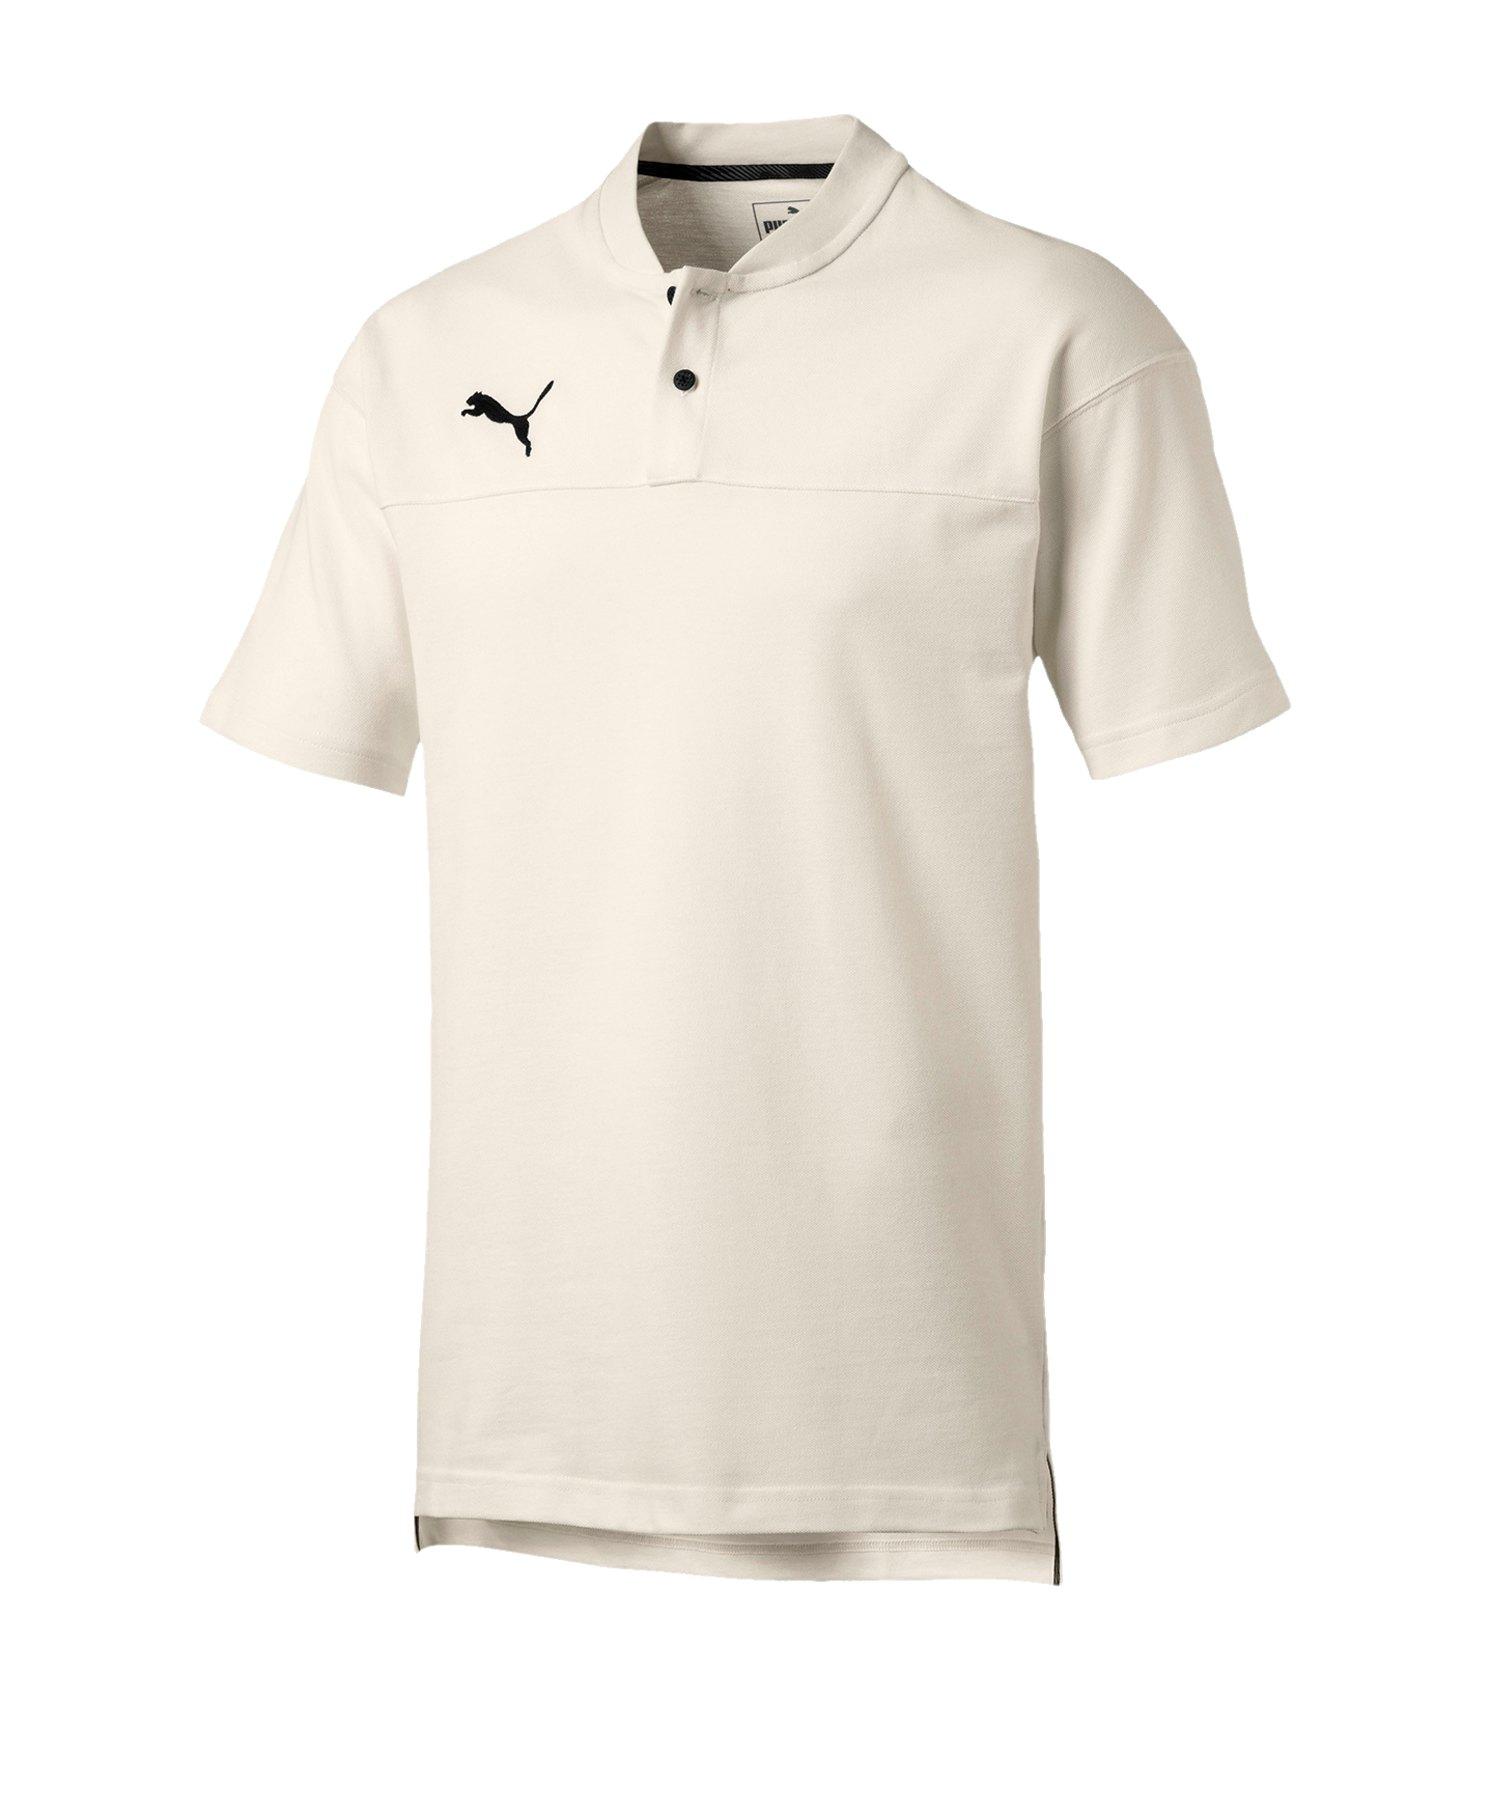 PUMA CUP Casual Poloshirt Weiss F04 - weiss